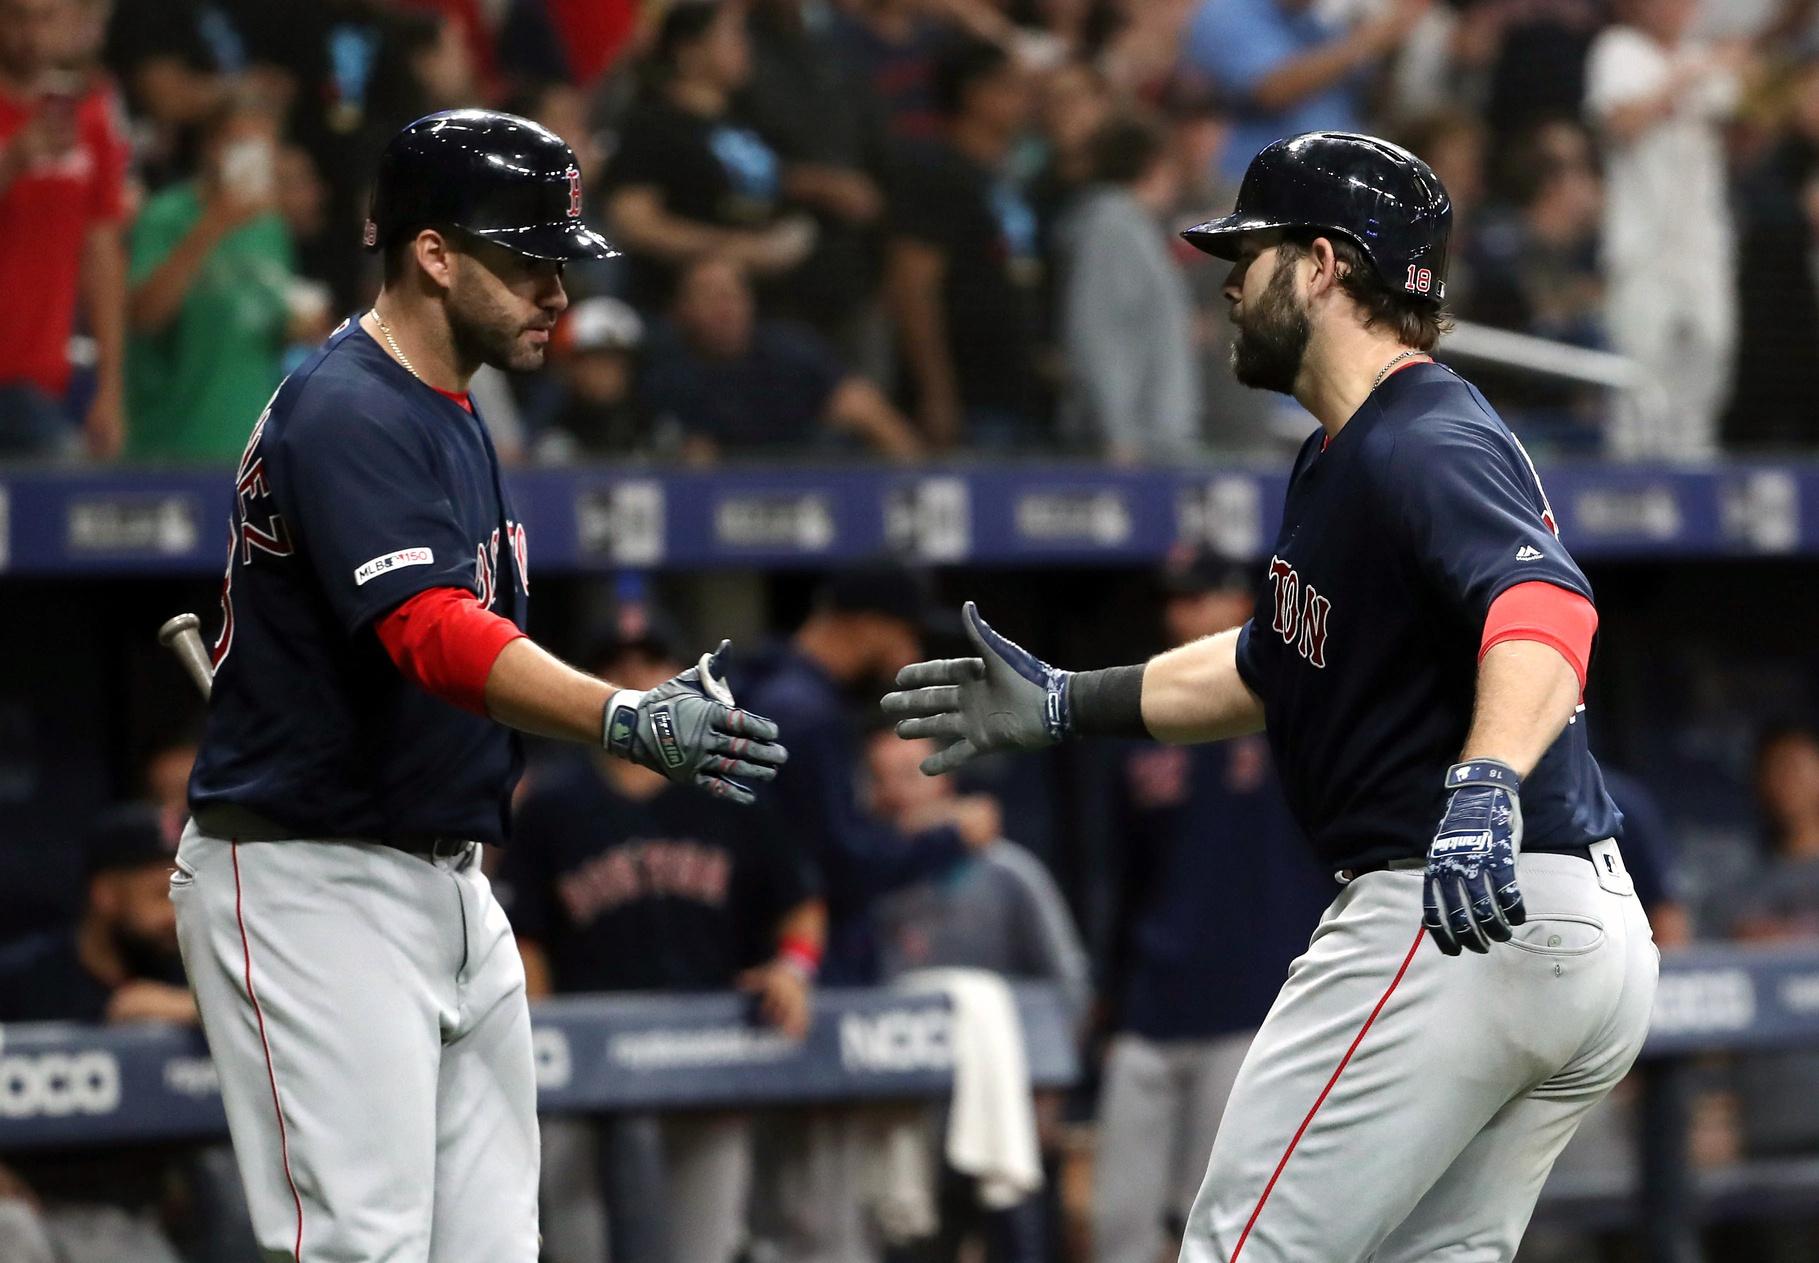 Fantasy Baseball Stacks: Top Offenses to Target for April 25